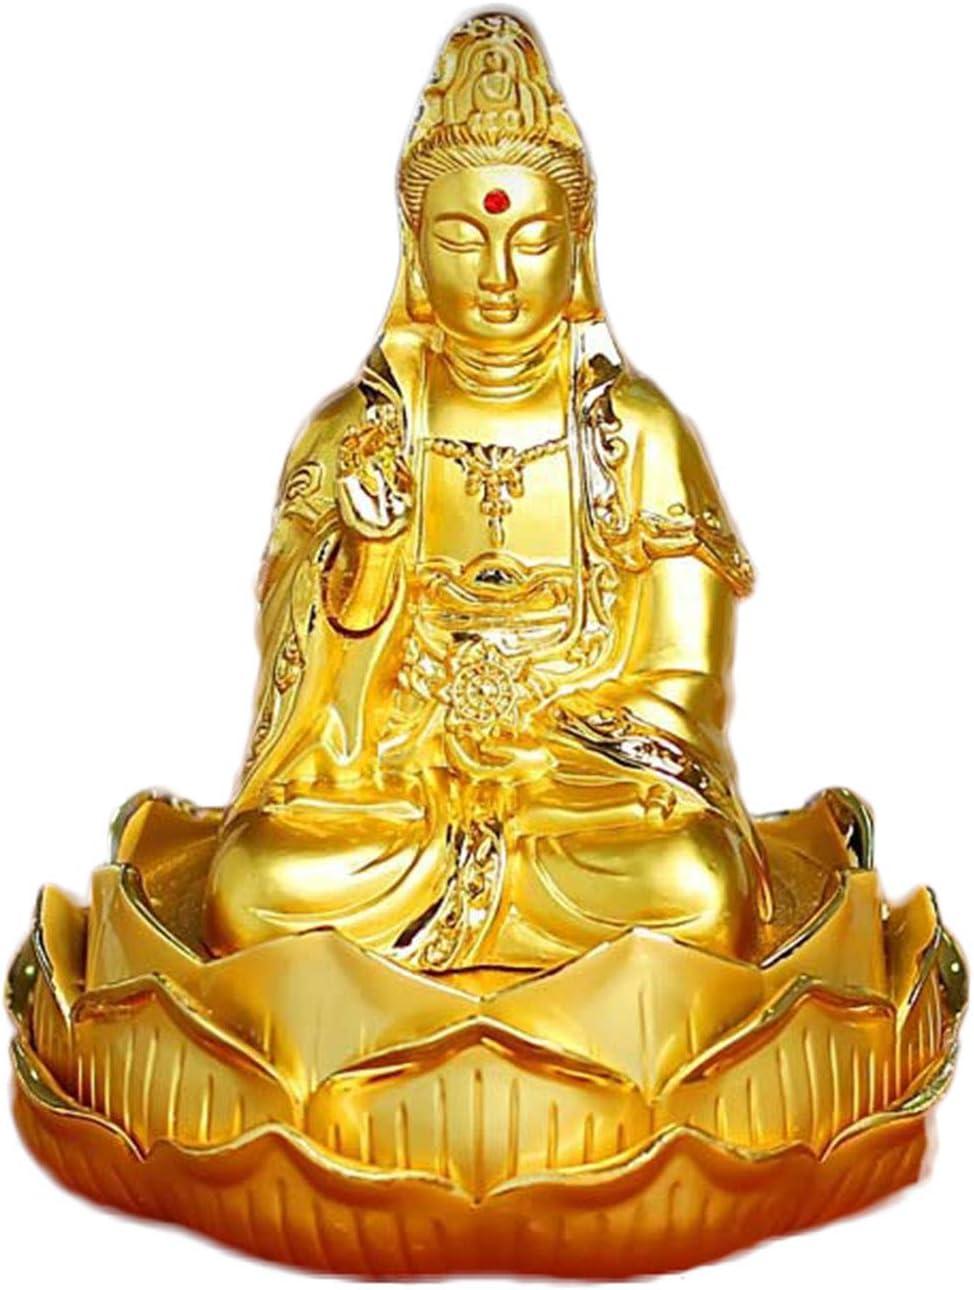 LHMYGHFDP Kuan Yin/Thousand Hand Guanyin Buddha Statue Feng Shui Car Car Flavor Air Freshener Wealth Lucky Statue Wedding Gift,A